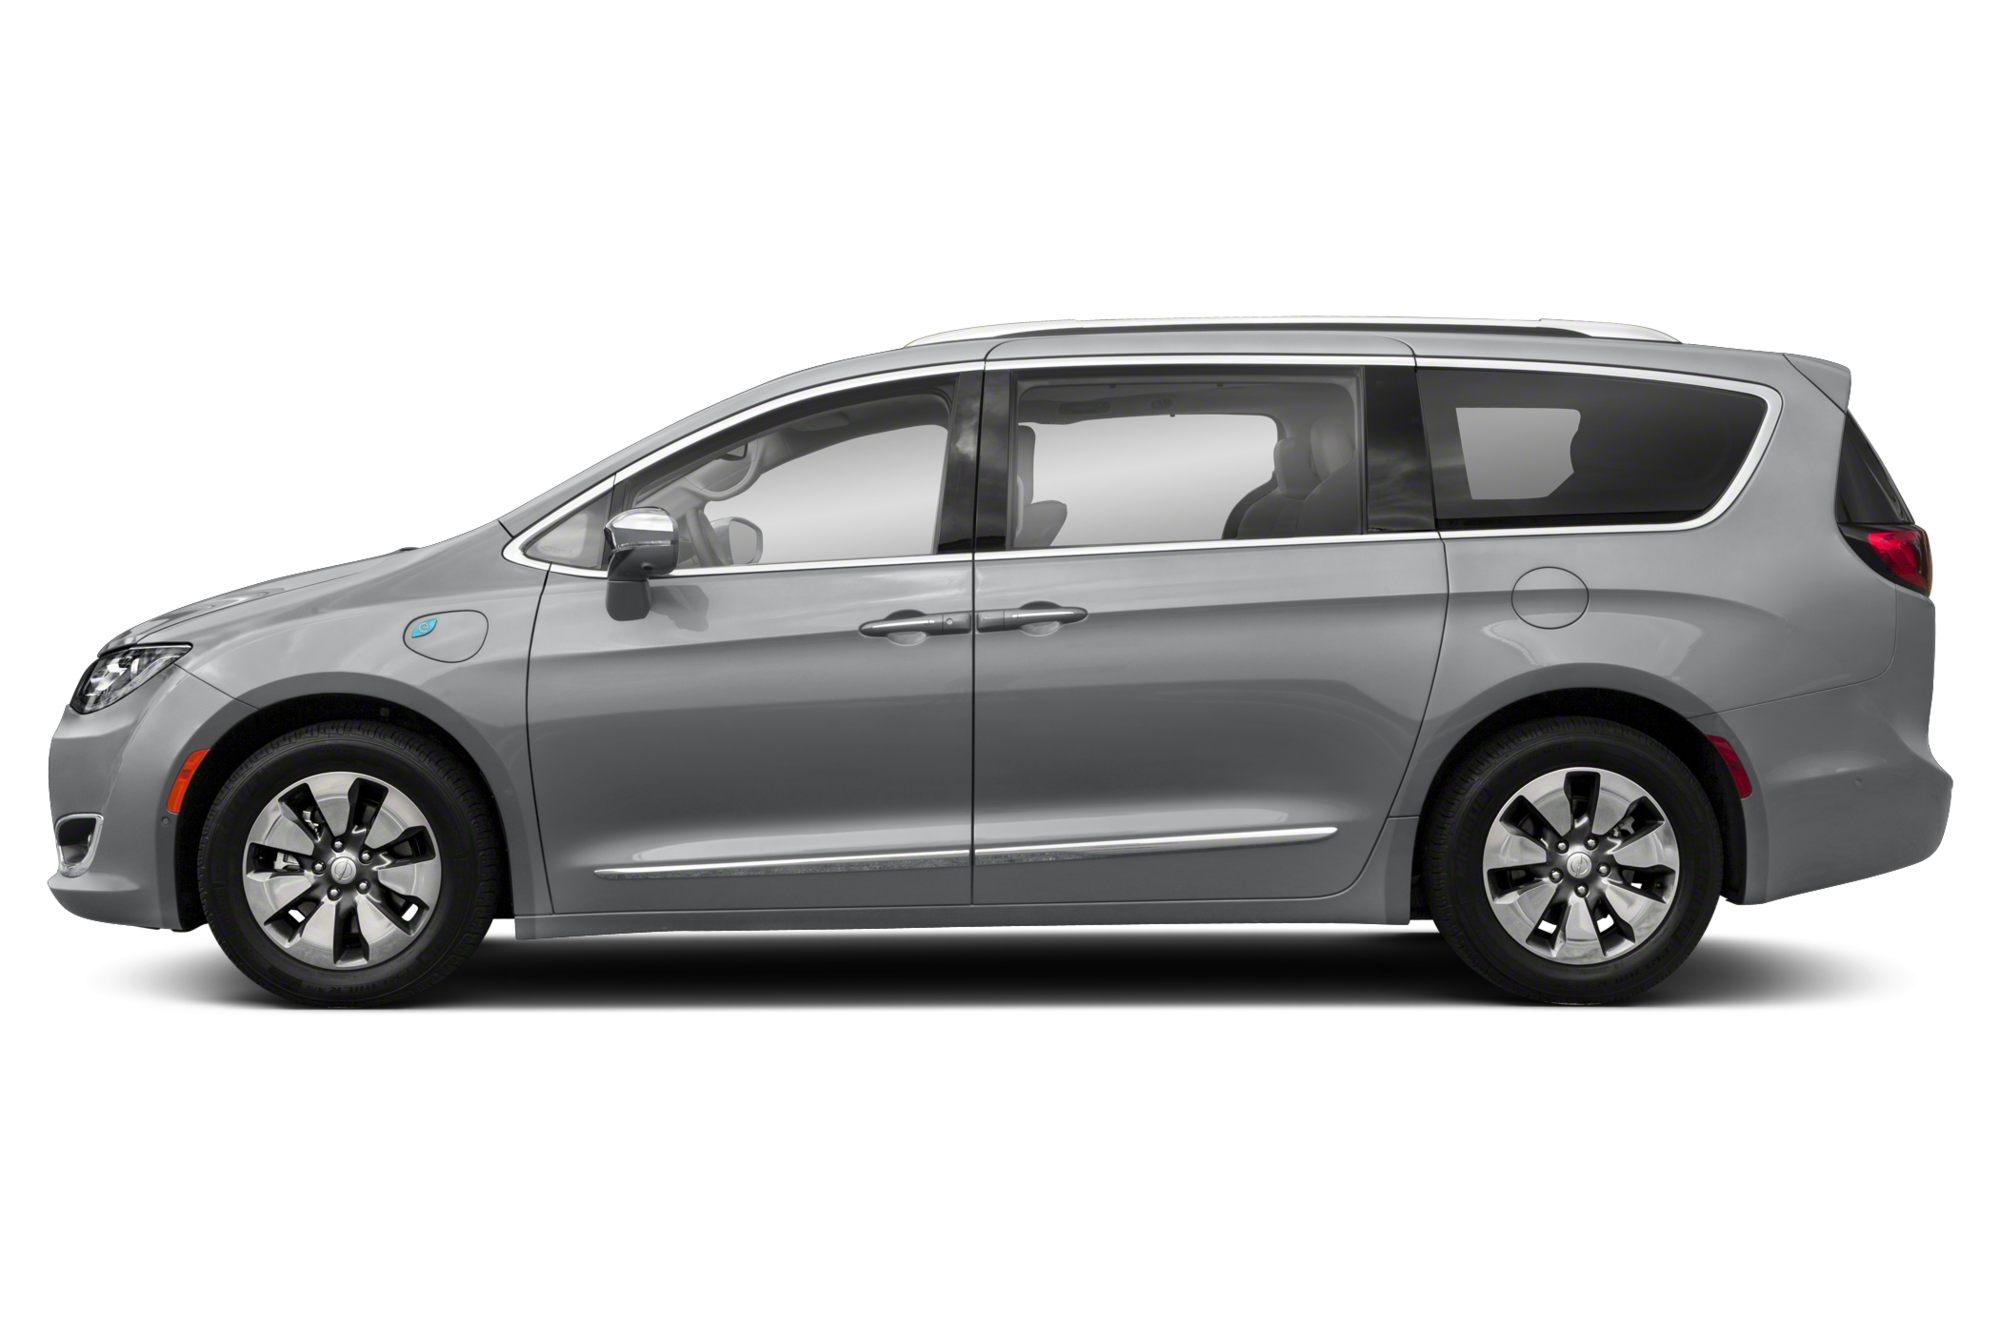 2017-2020 Chrysler Pacifica Hybrid: Recall Alert